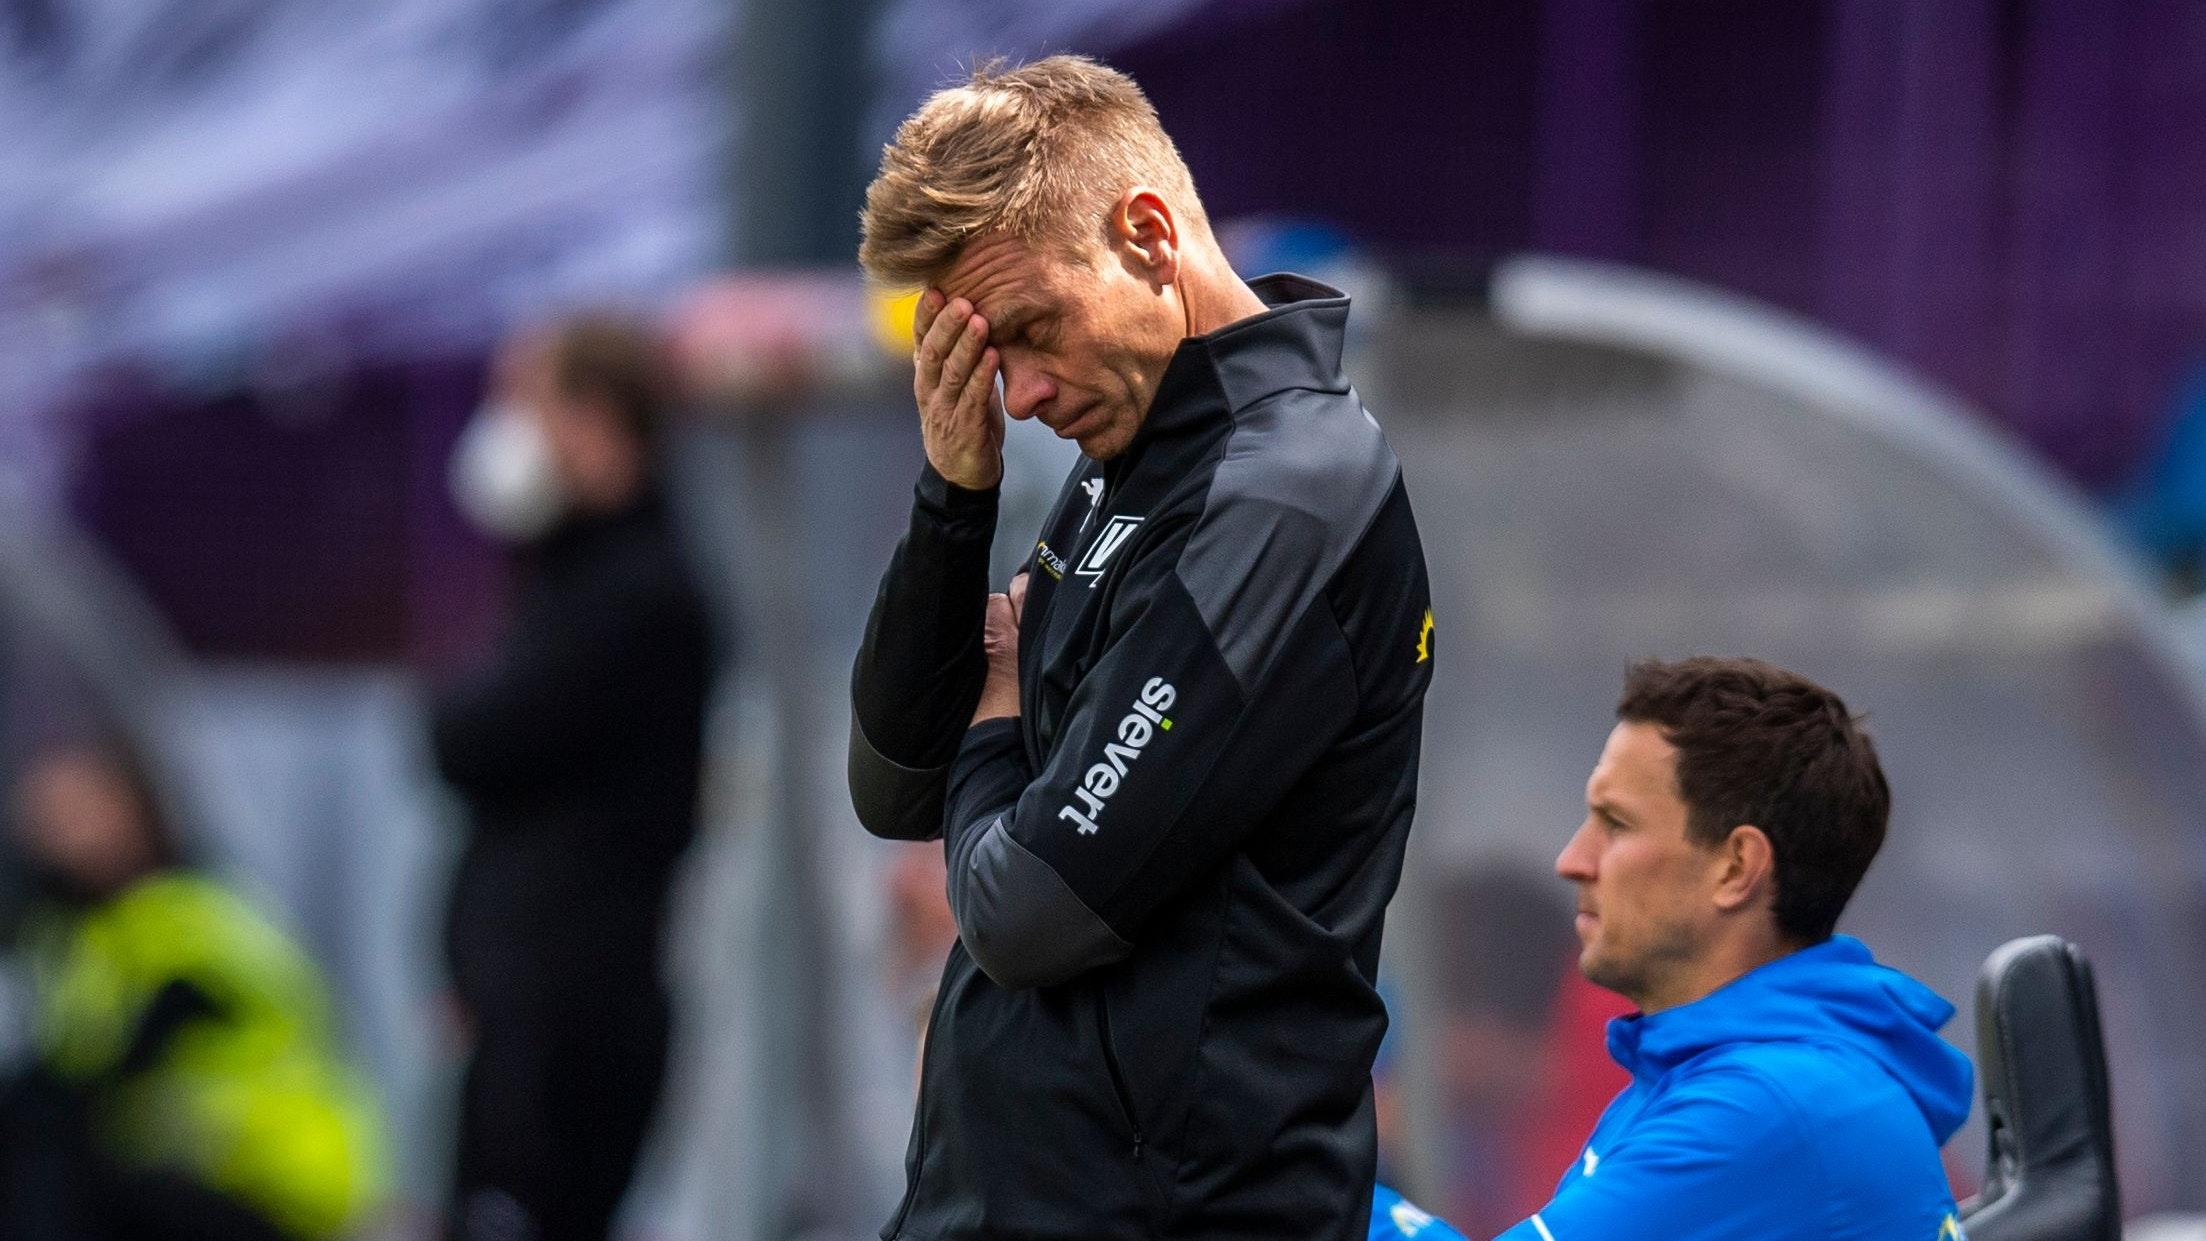 Frust an der Bremer Brücke: Osnabrücks Trainer Markus Feldhoff im Spiel gegen Kiel. Foto: dpa/Inderlied